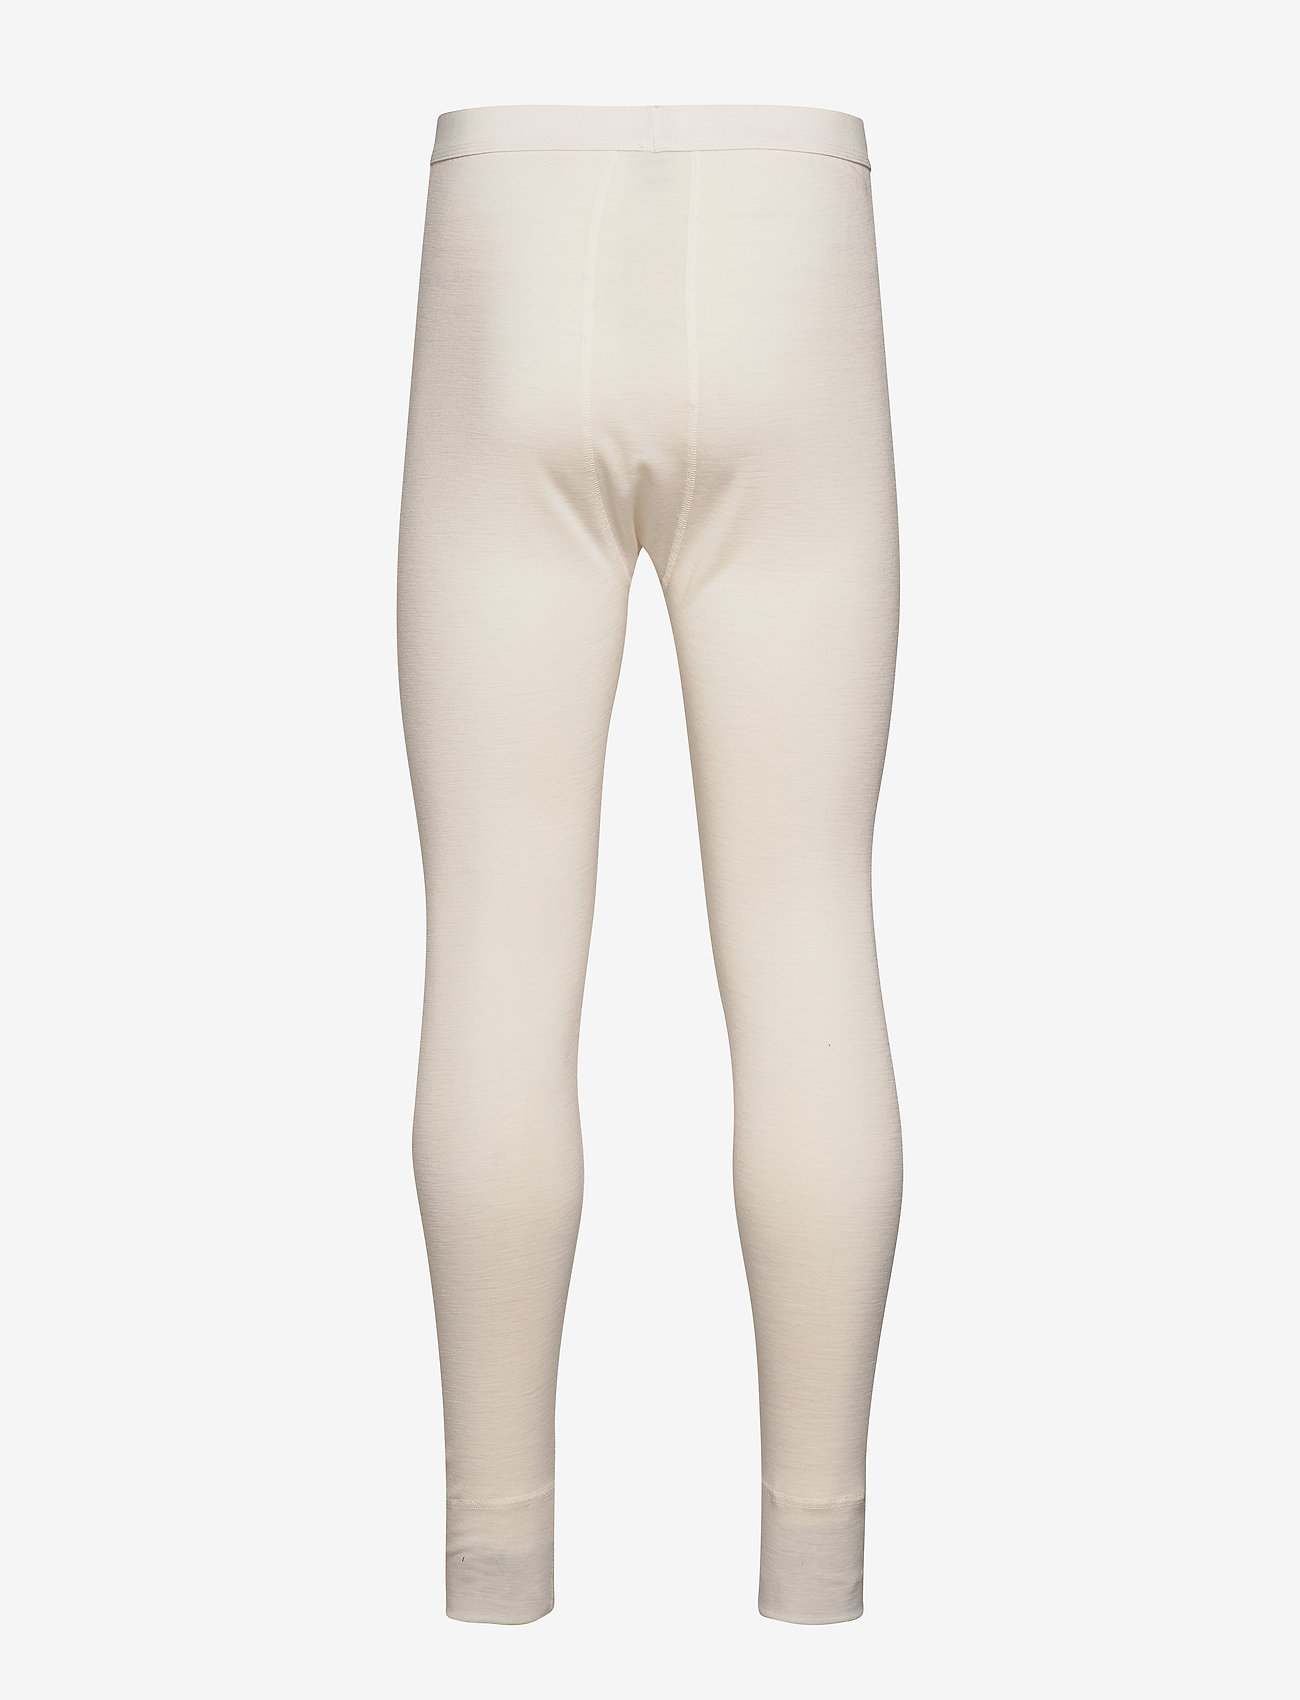 JBS - JBS, long johns - lange unterhosen - white - 1